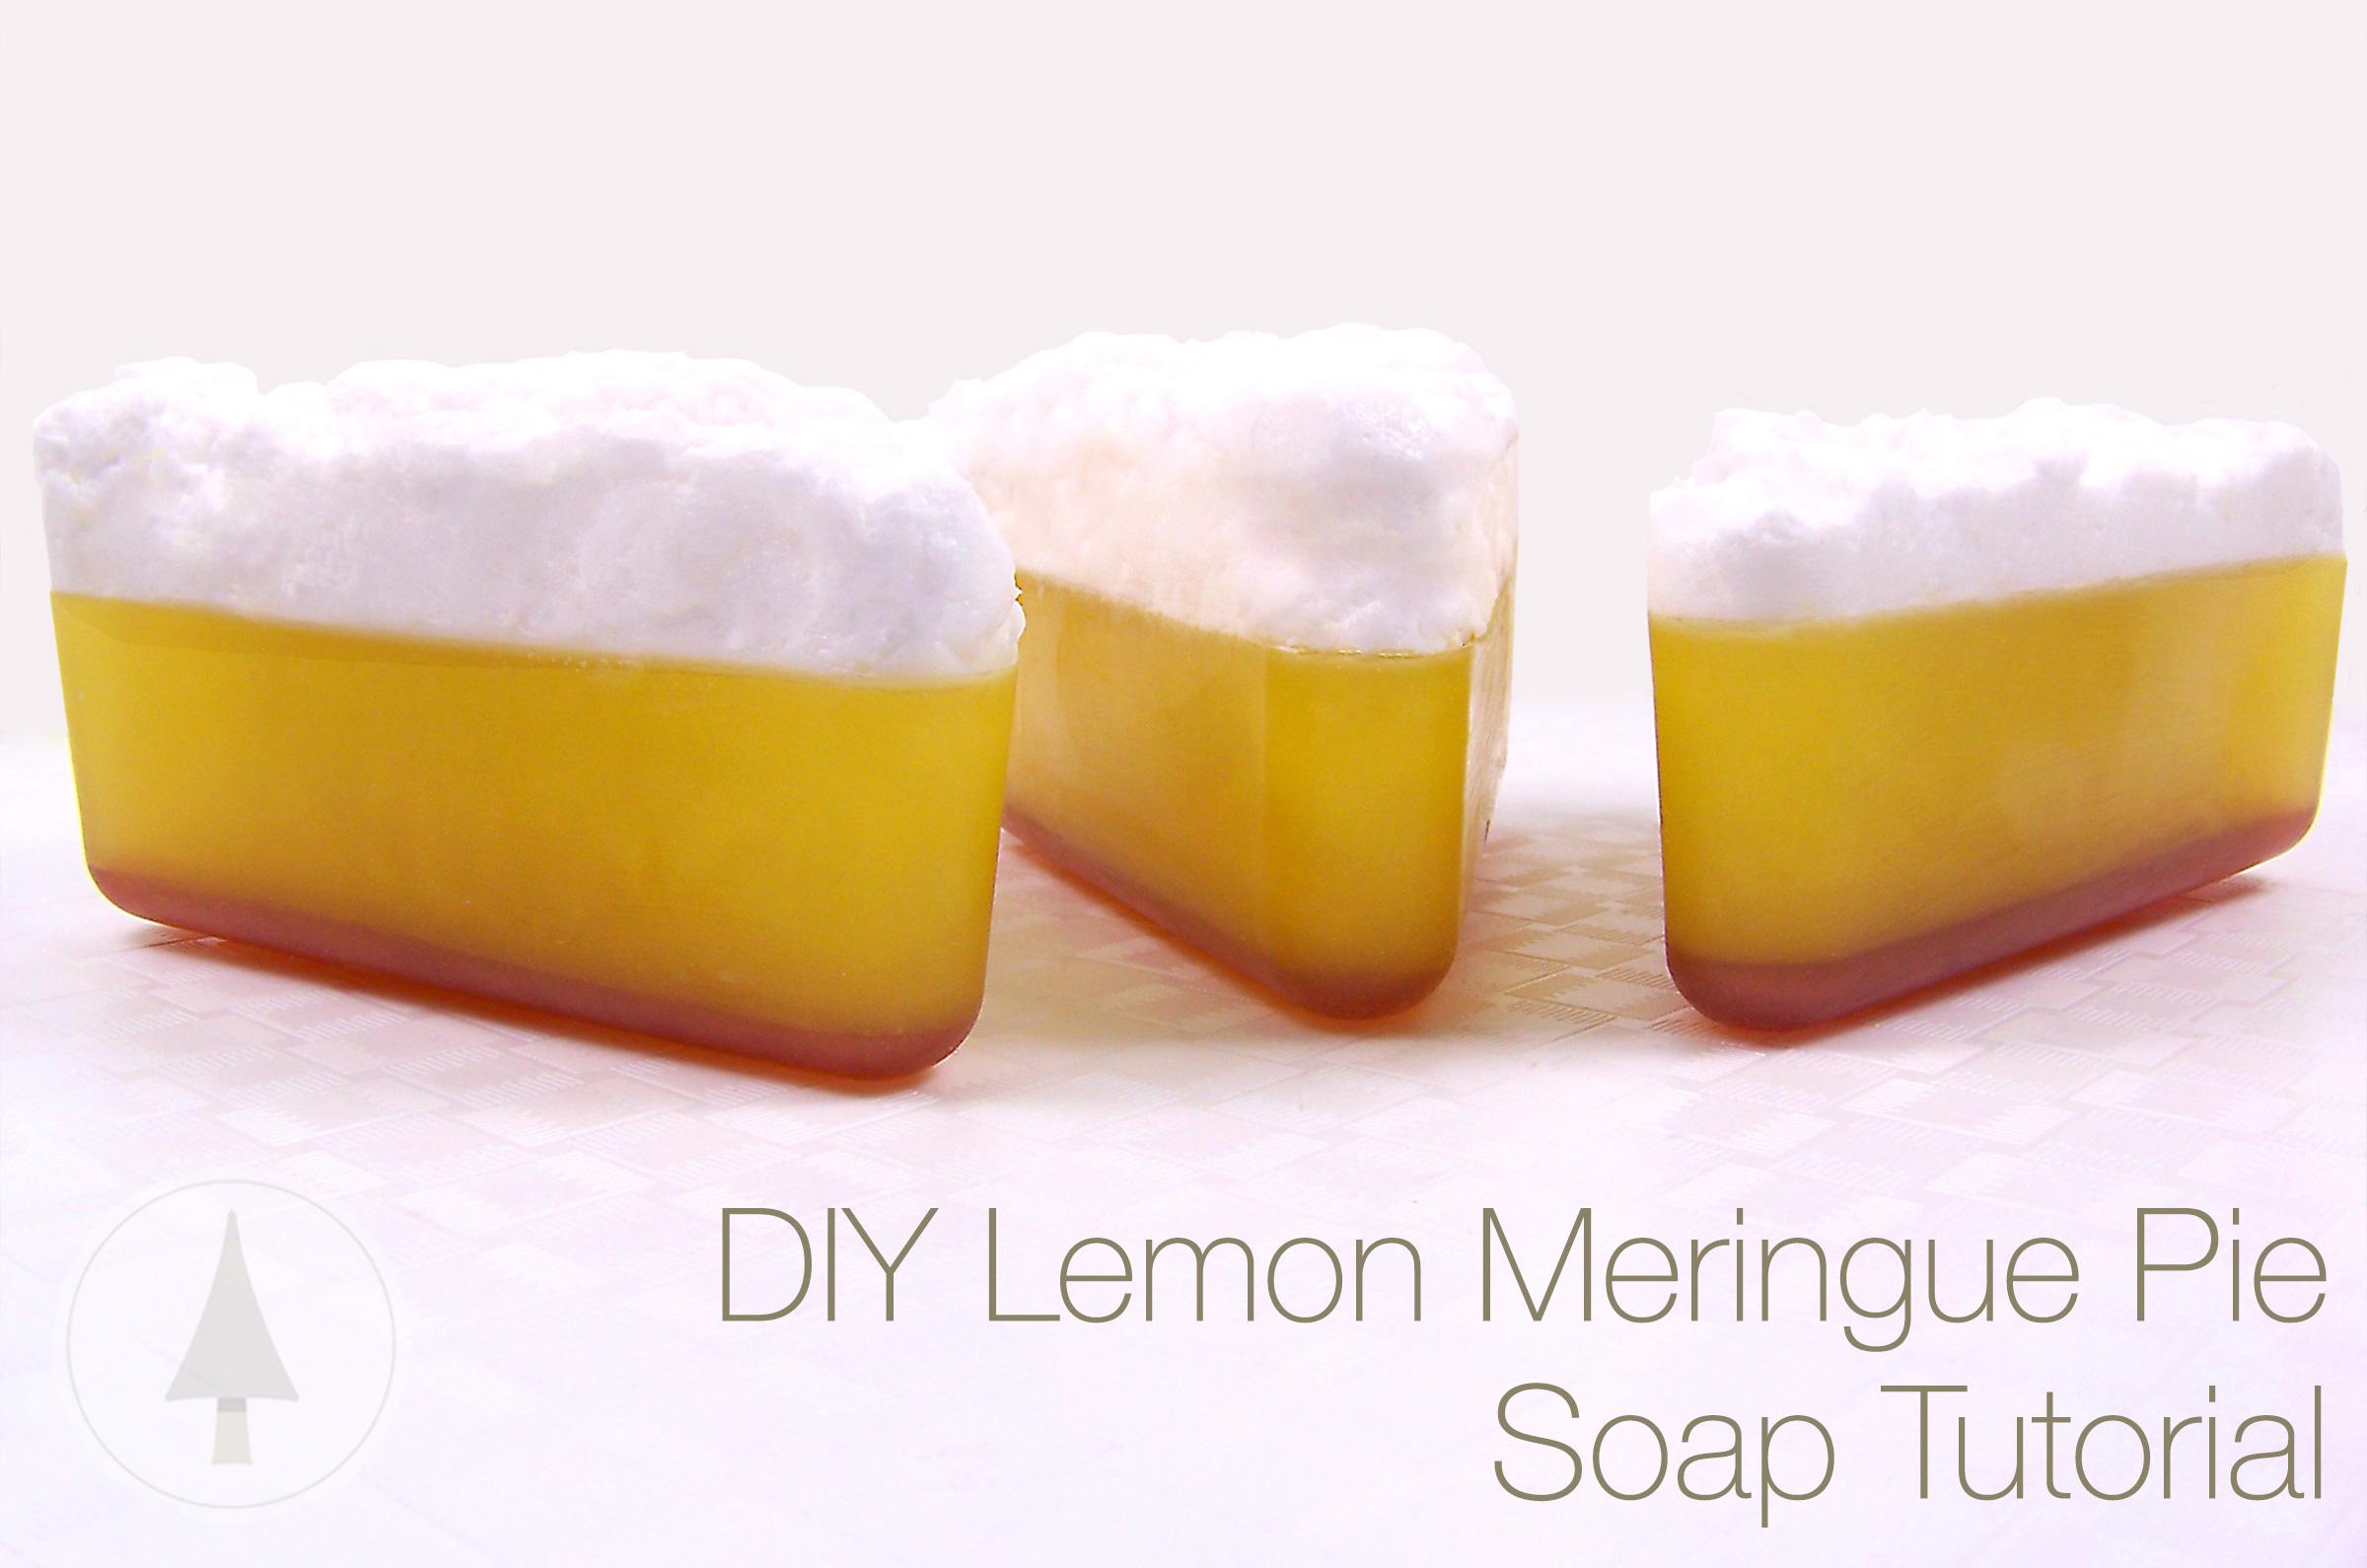 refreshing lemon meringue pie soap!